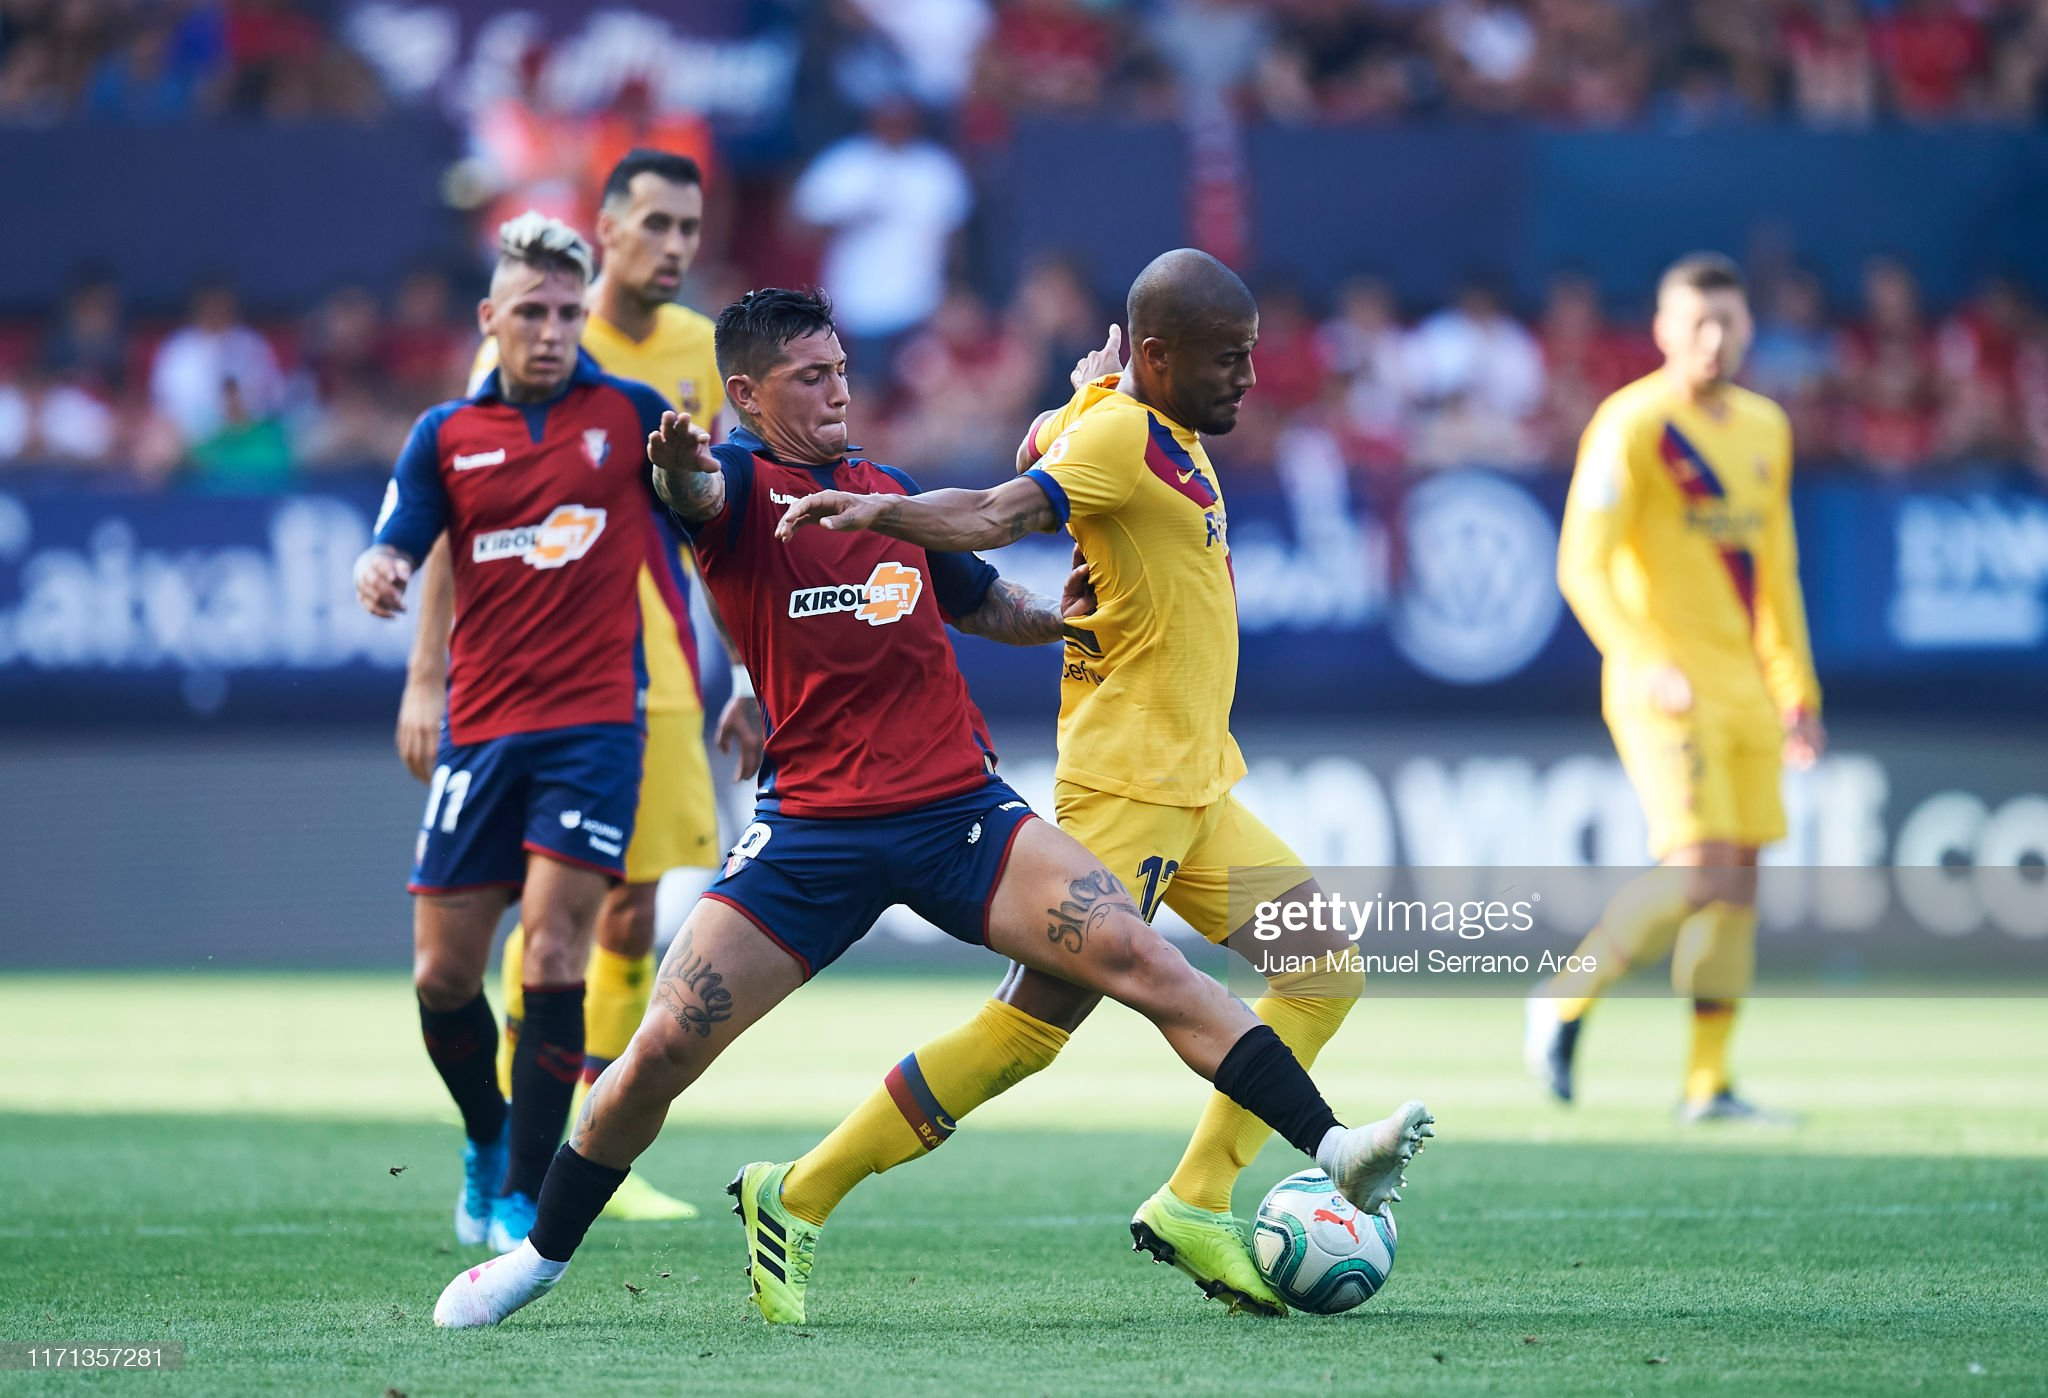 صور مباراة : أوساسونا - برشلونة 2-2 ( 31-08-2019 )  Facundo-roncaglia-of-ca-osasuna-competes-for-the-ball-with-rafinha-picture-id1171357281?s=2048x2048